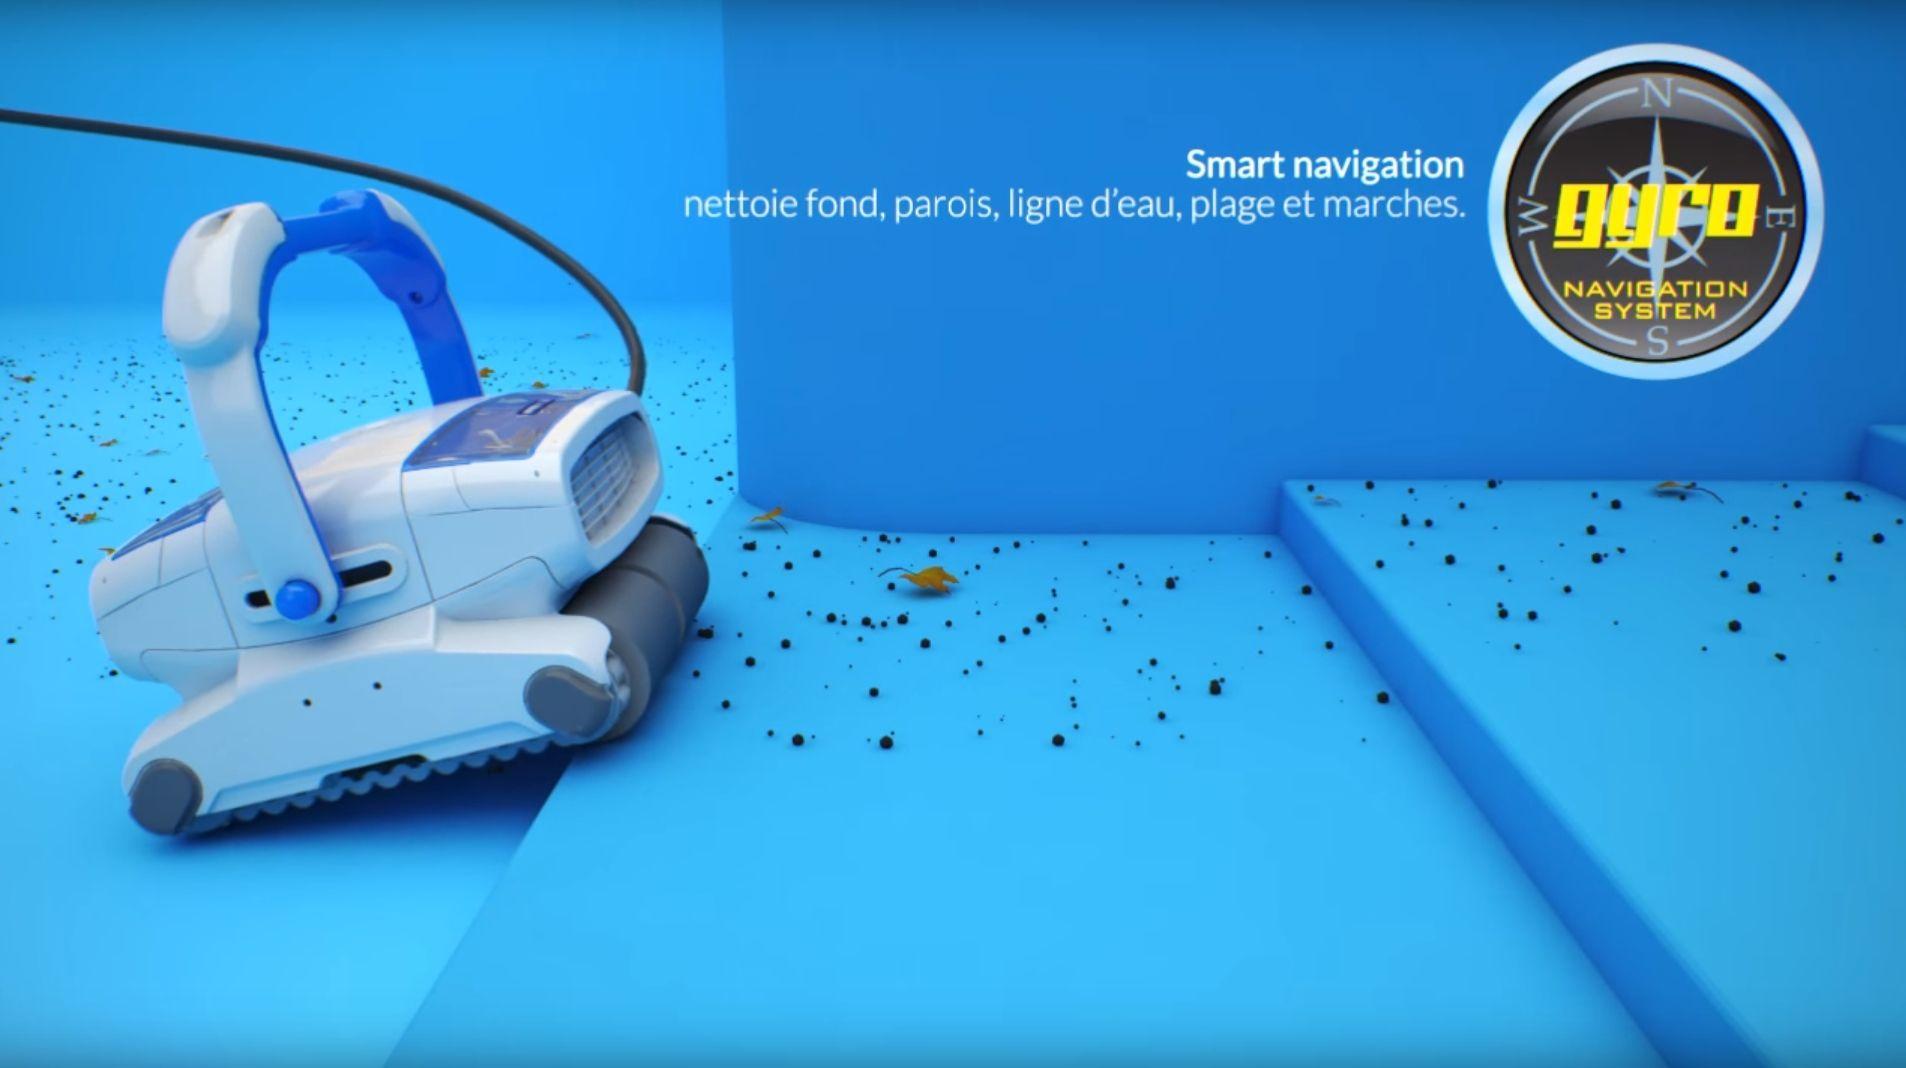 eau oxygne piscine traitement piscine au sel bayrol a. Black Bedroom Furniture Sets. Home Design Ideas